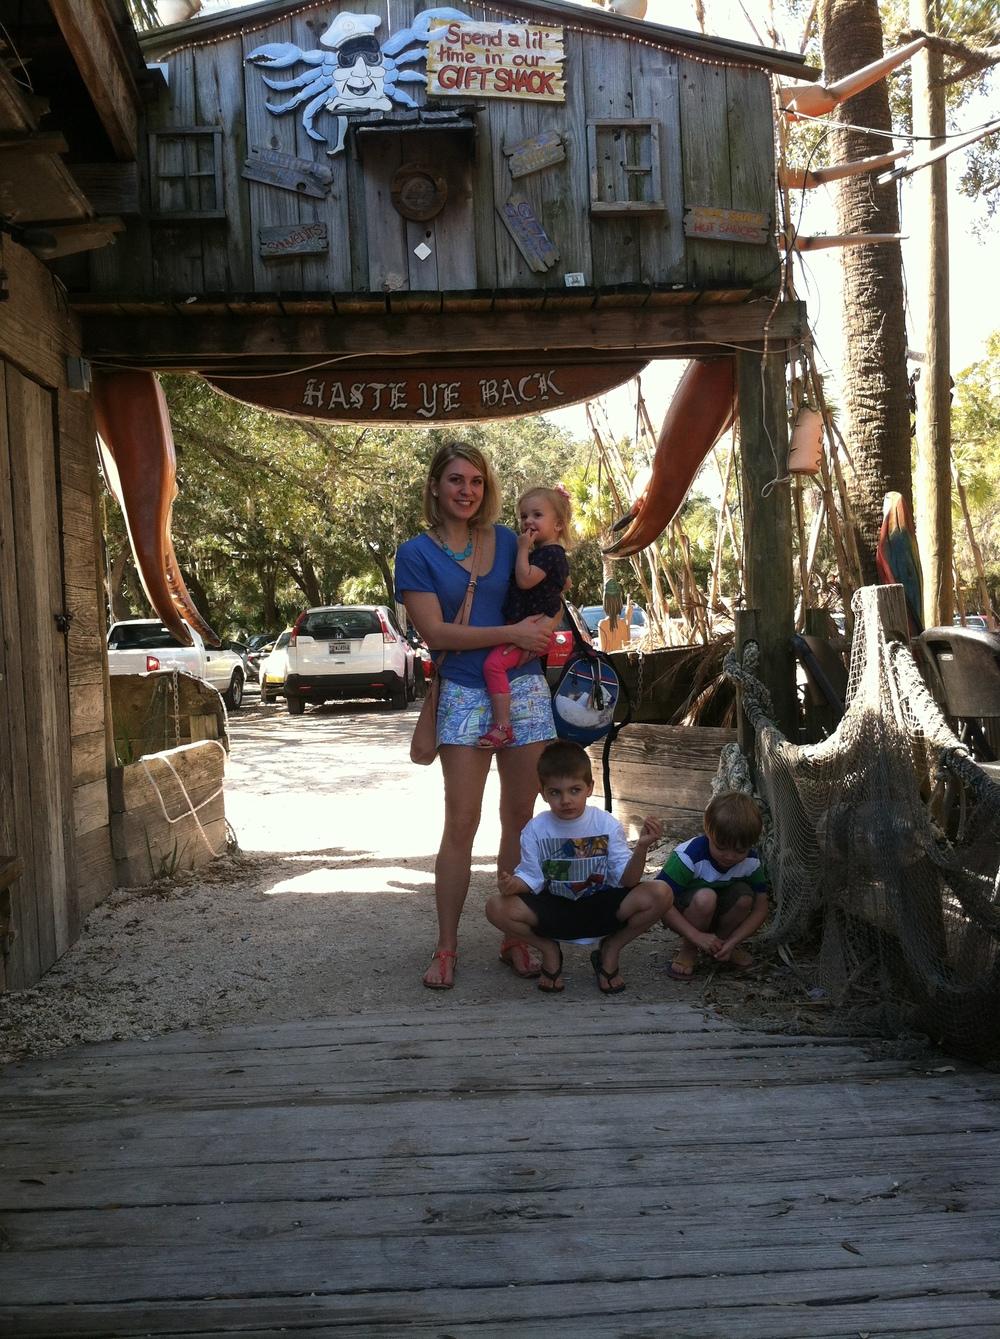 Me & the nephews/niece outside the bird shack!